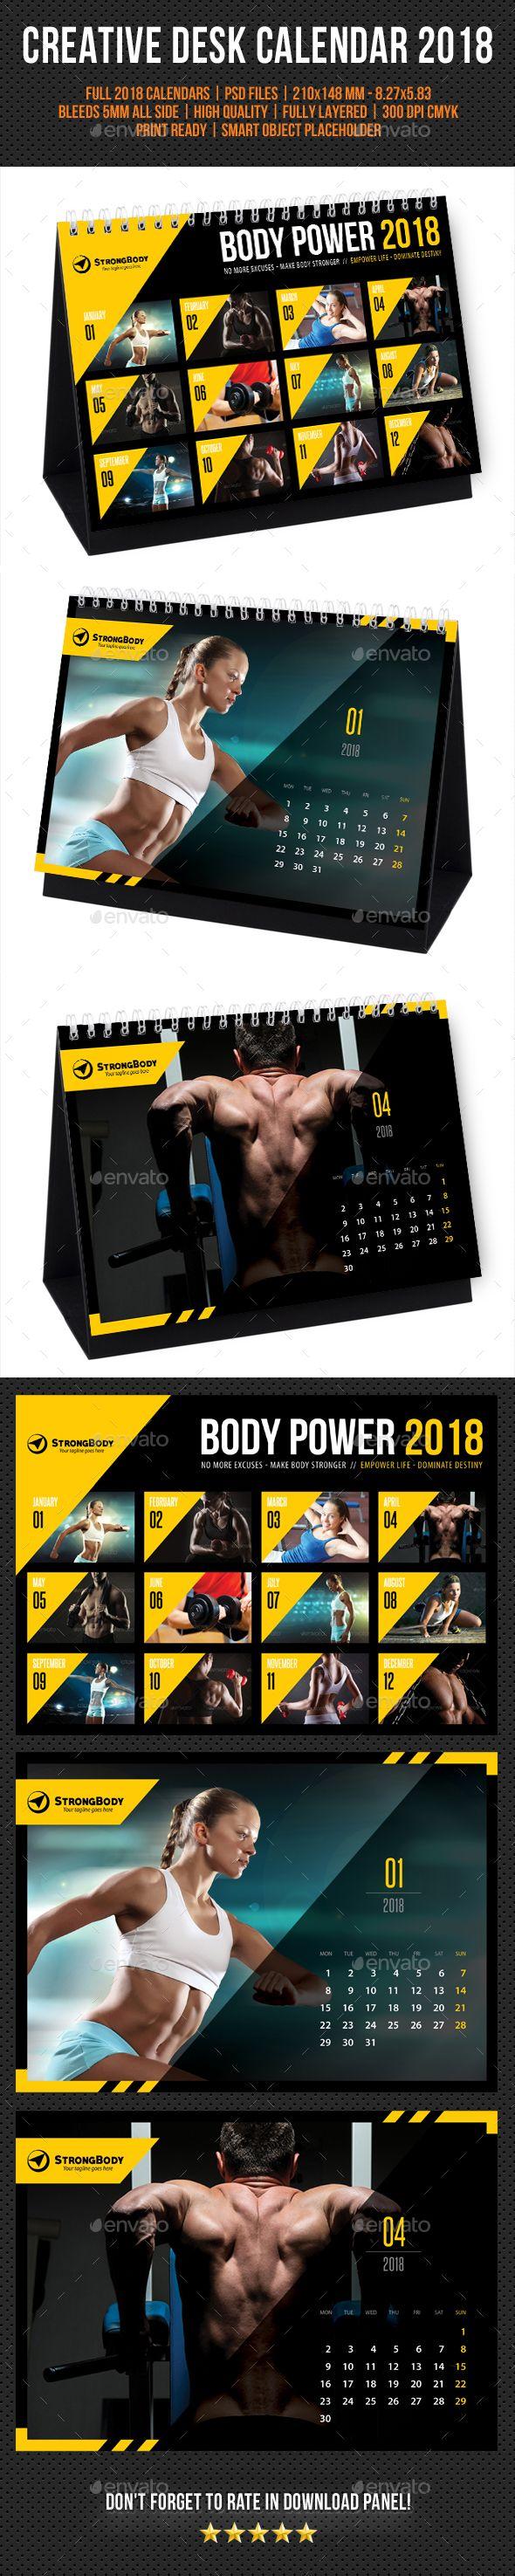 #Creative #Desk #Calendar #template #2018 V30 - Calendars #Stationery #fitness #gym #muscle #design. download: https://graphicriver.net/item/creative-wall-calendar-2018-v03/20324787?ref=yinkira